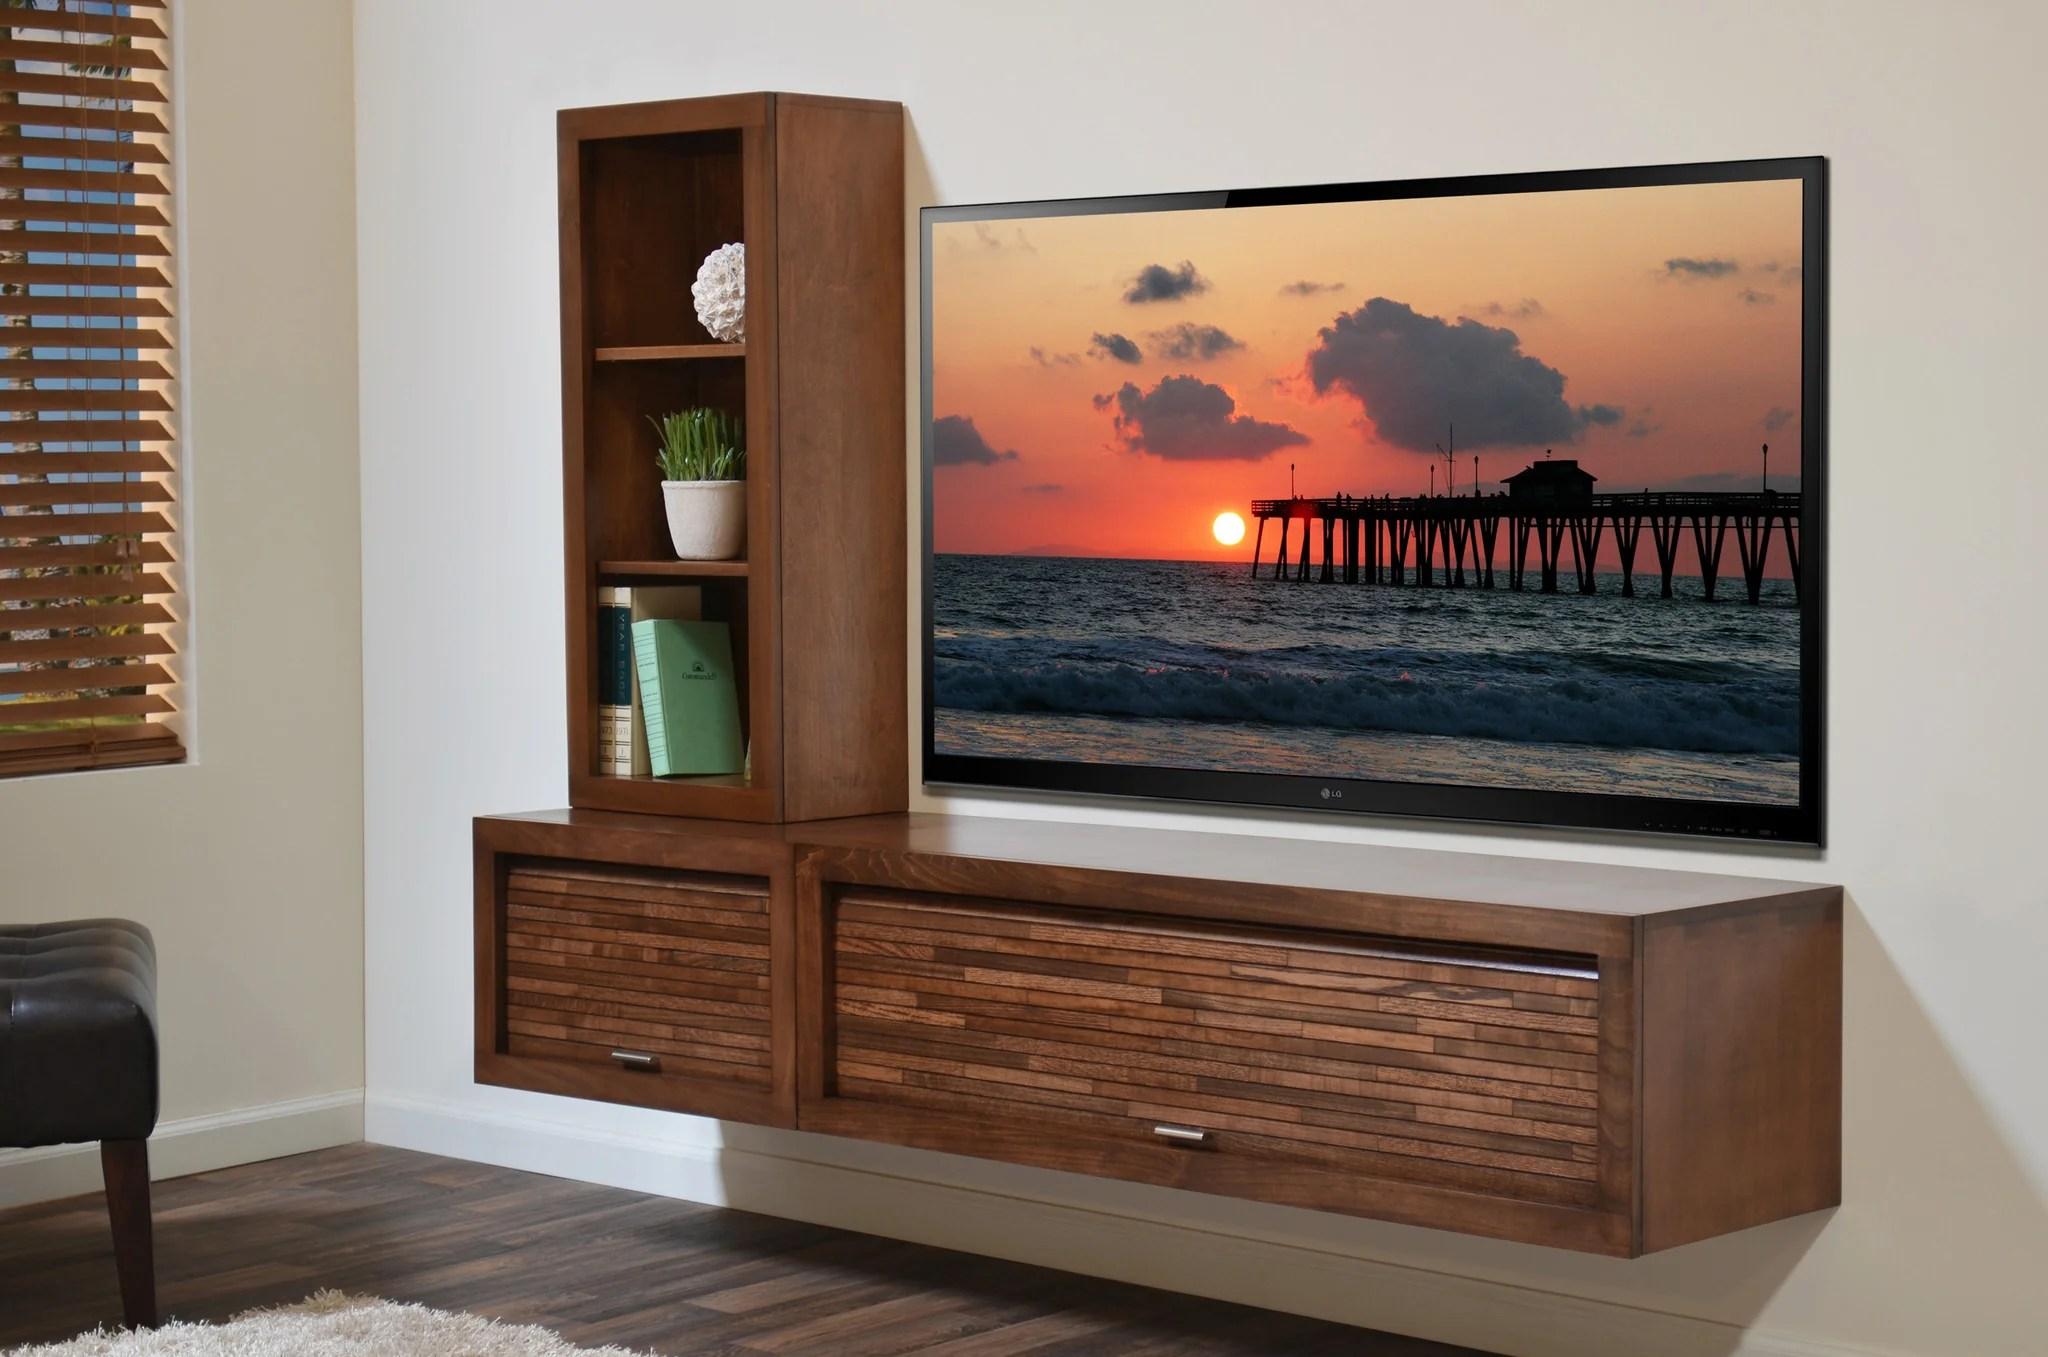 Wall Mount Entertainment Center Tv Console - Eco Geo Mocha